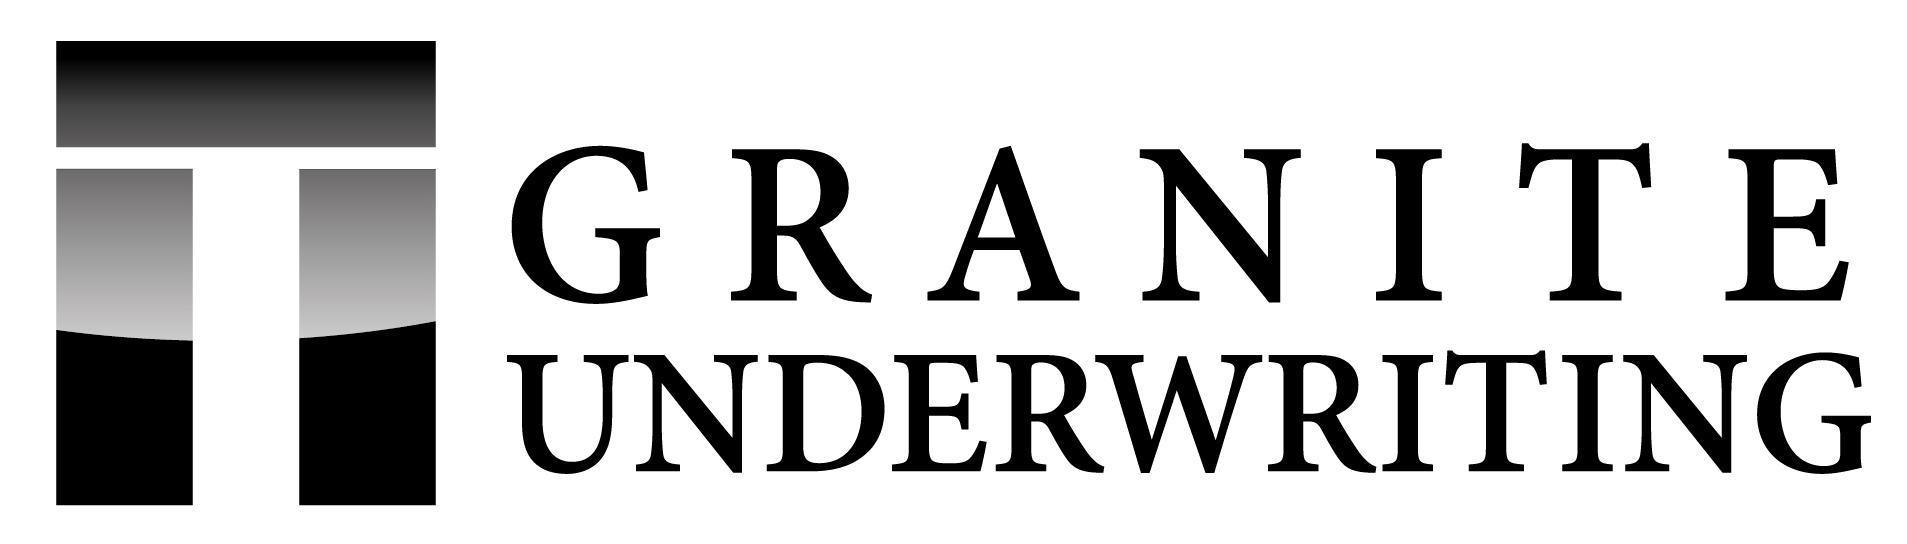 Granite Underwriting company logo